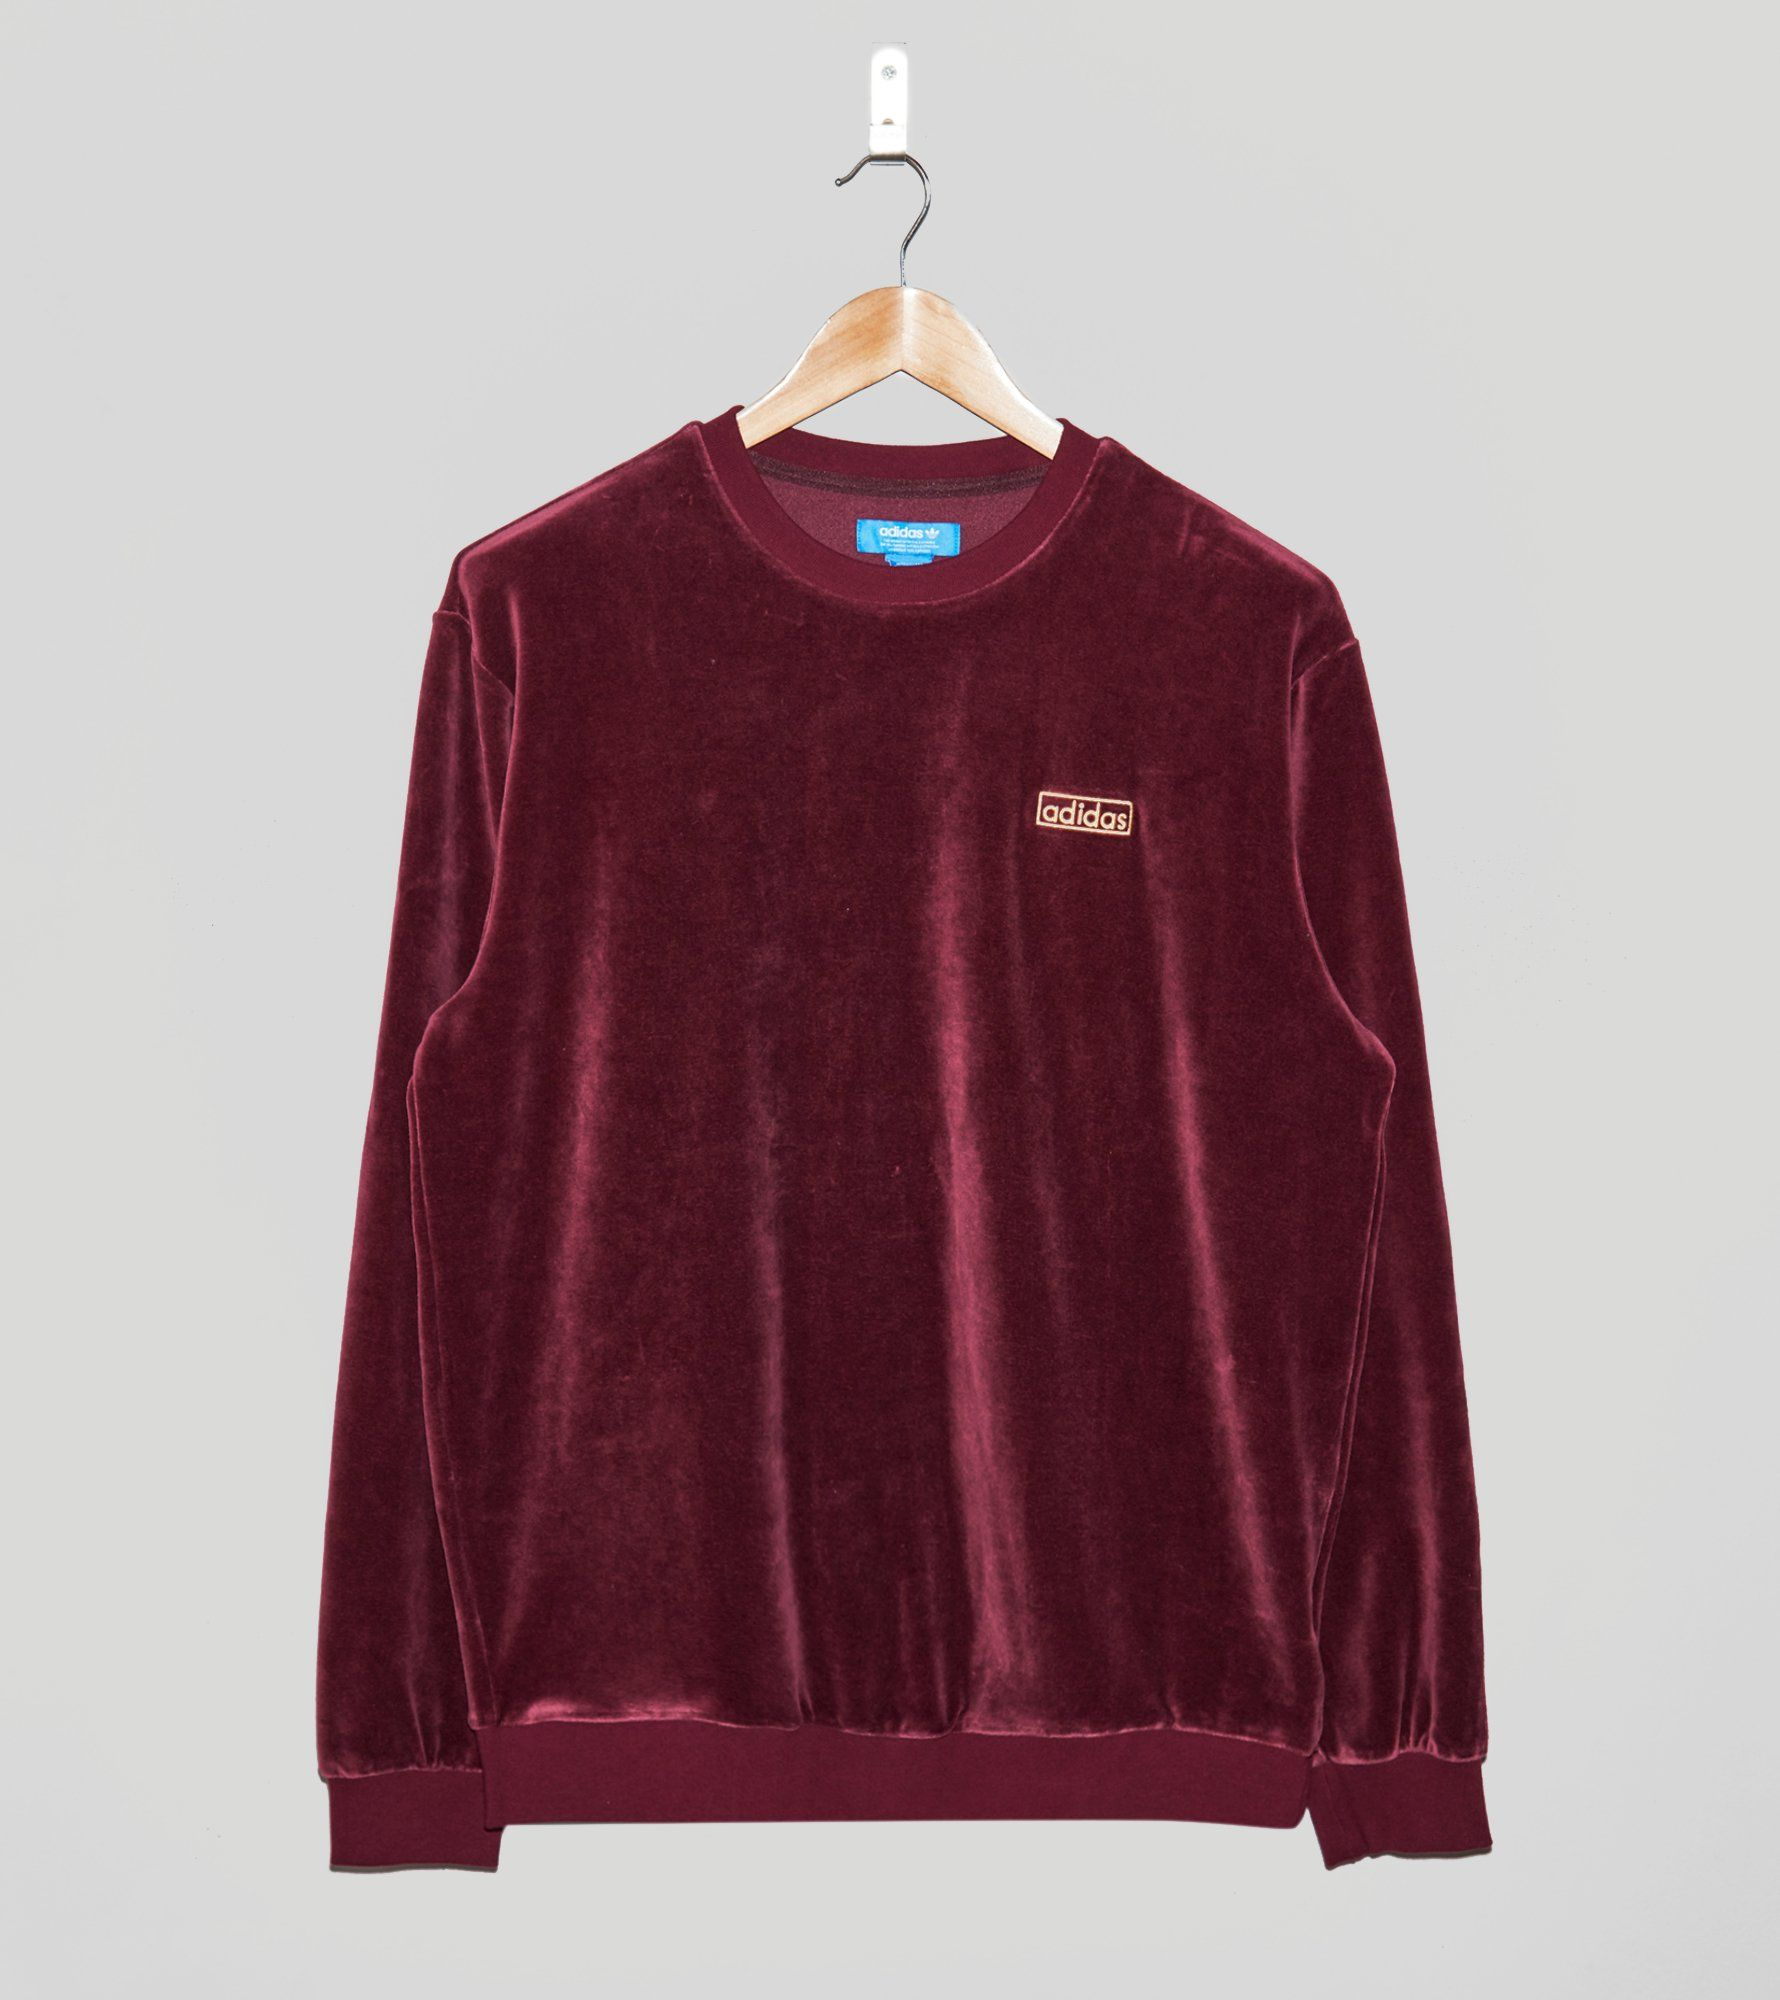 adidas Originals Velour Crew Sweatshirt